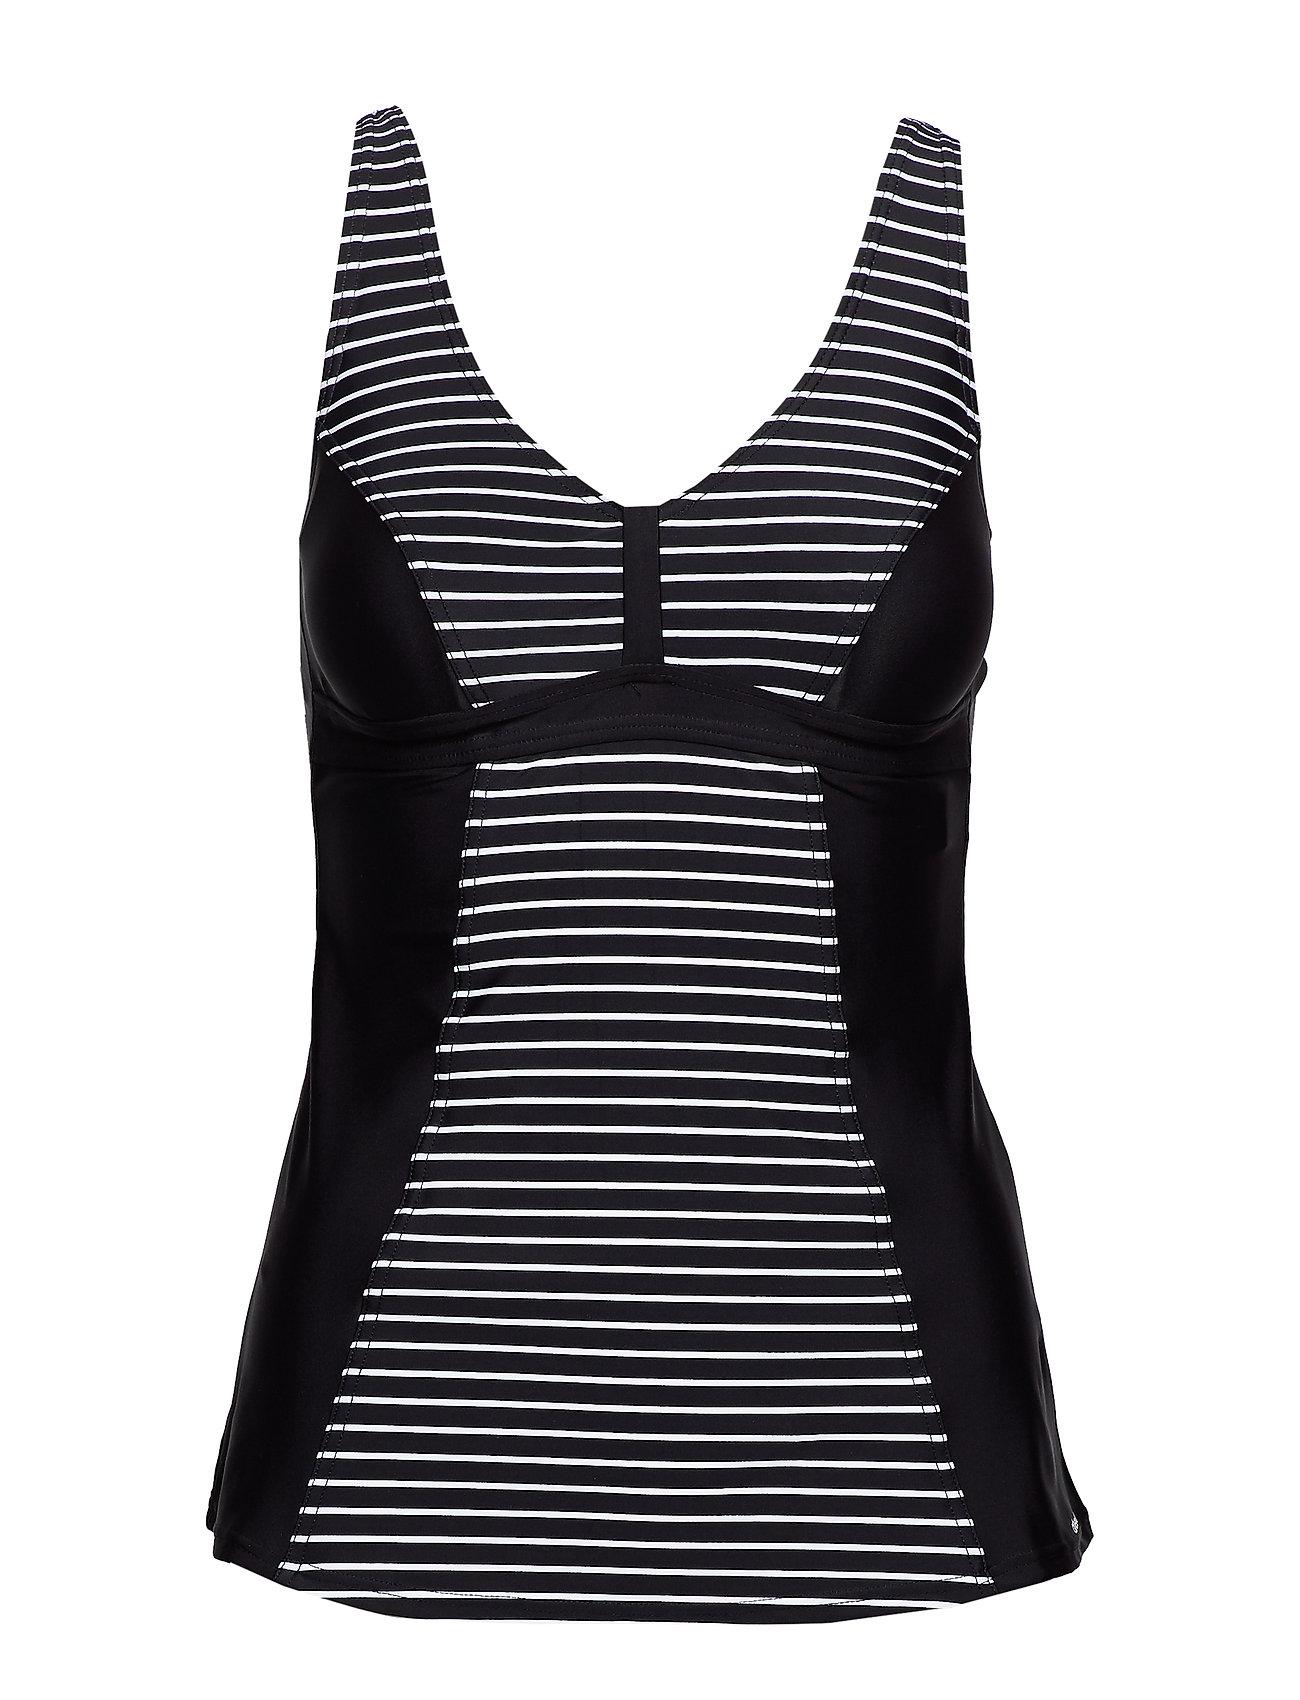 Abecita Wild in stripes - BLACK/WHITE